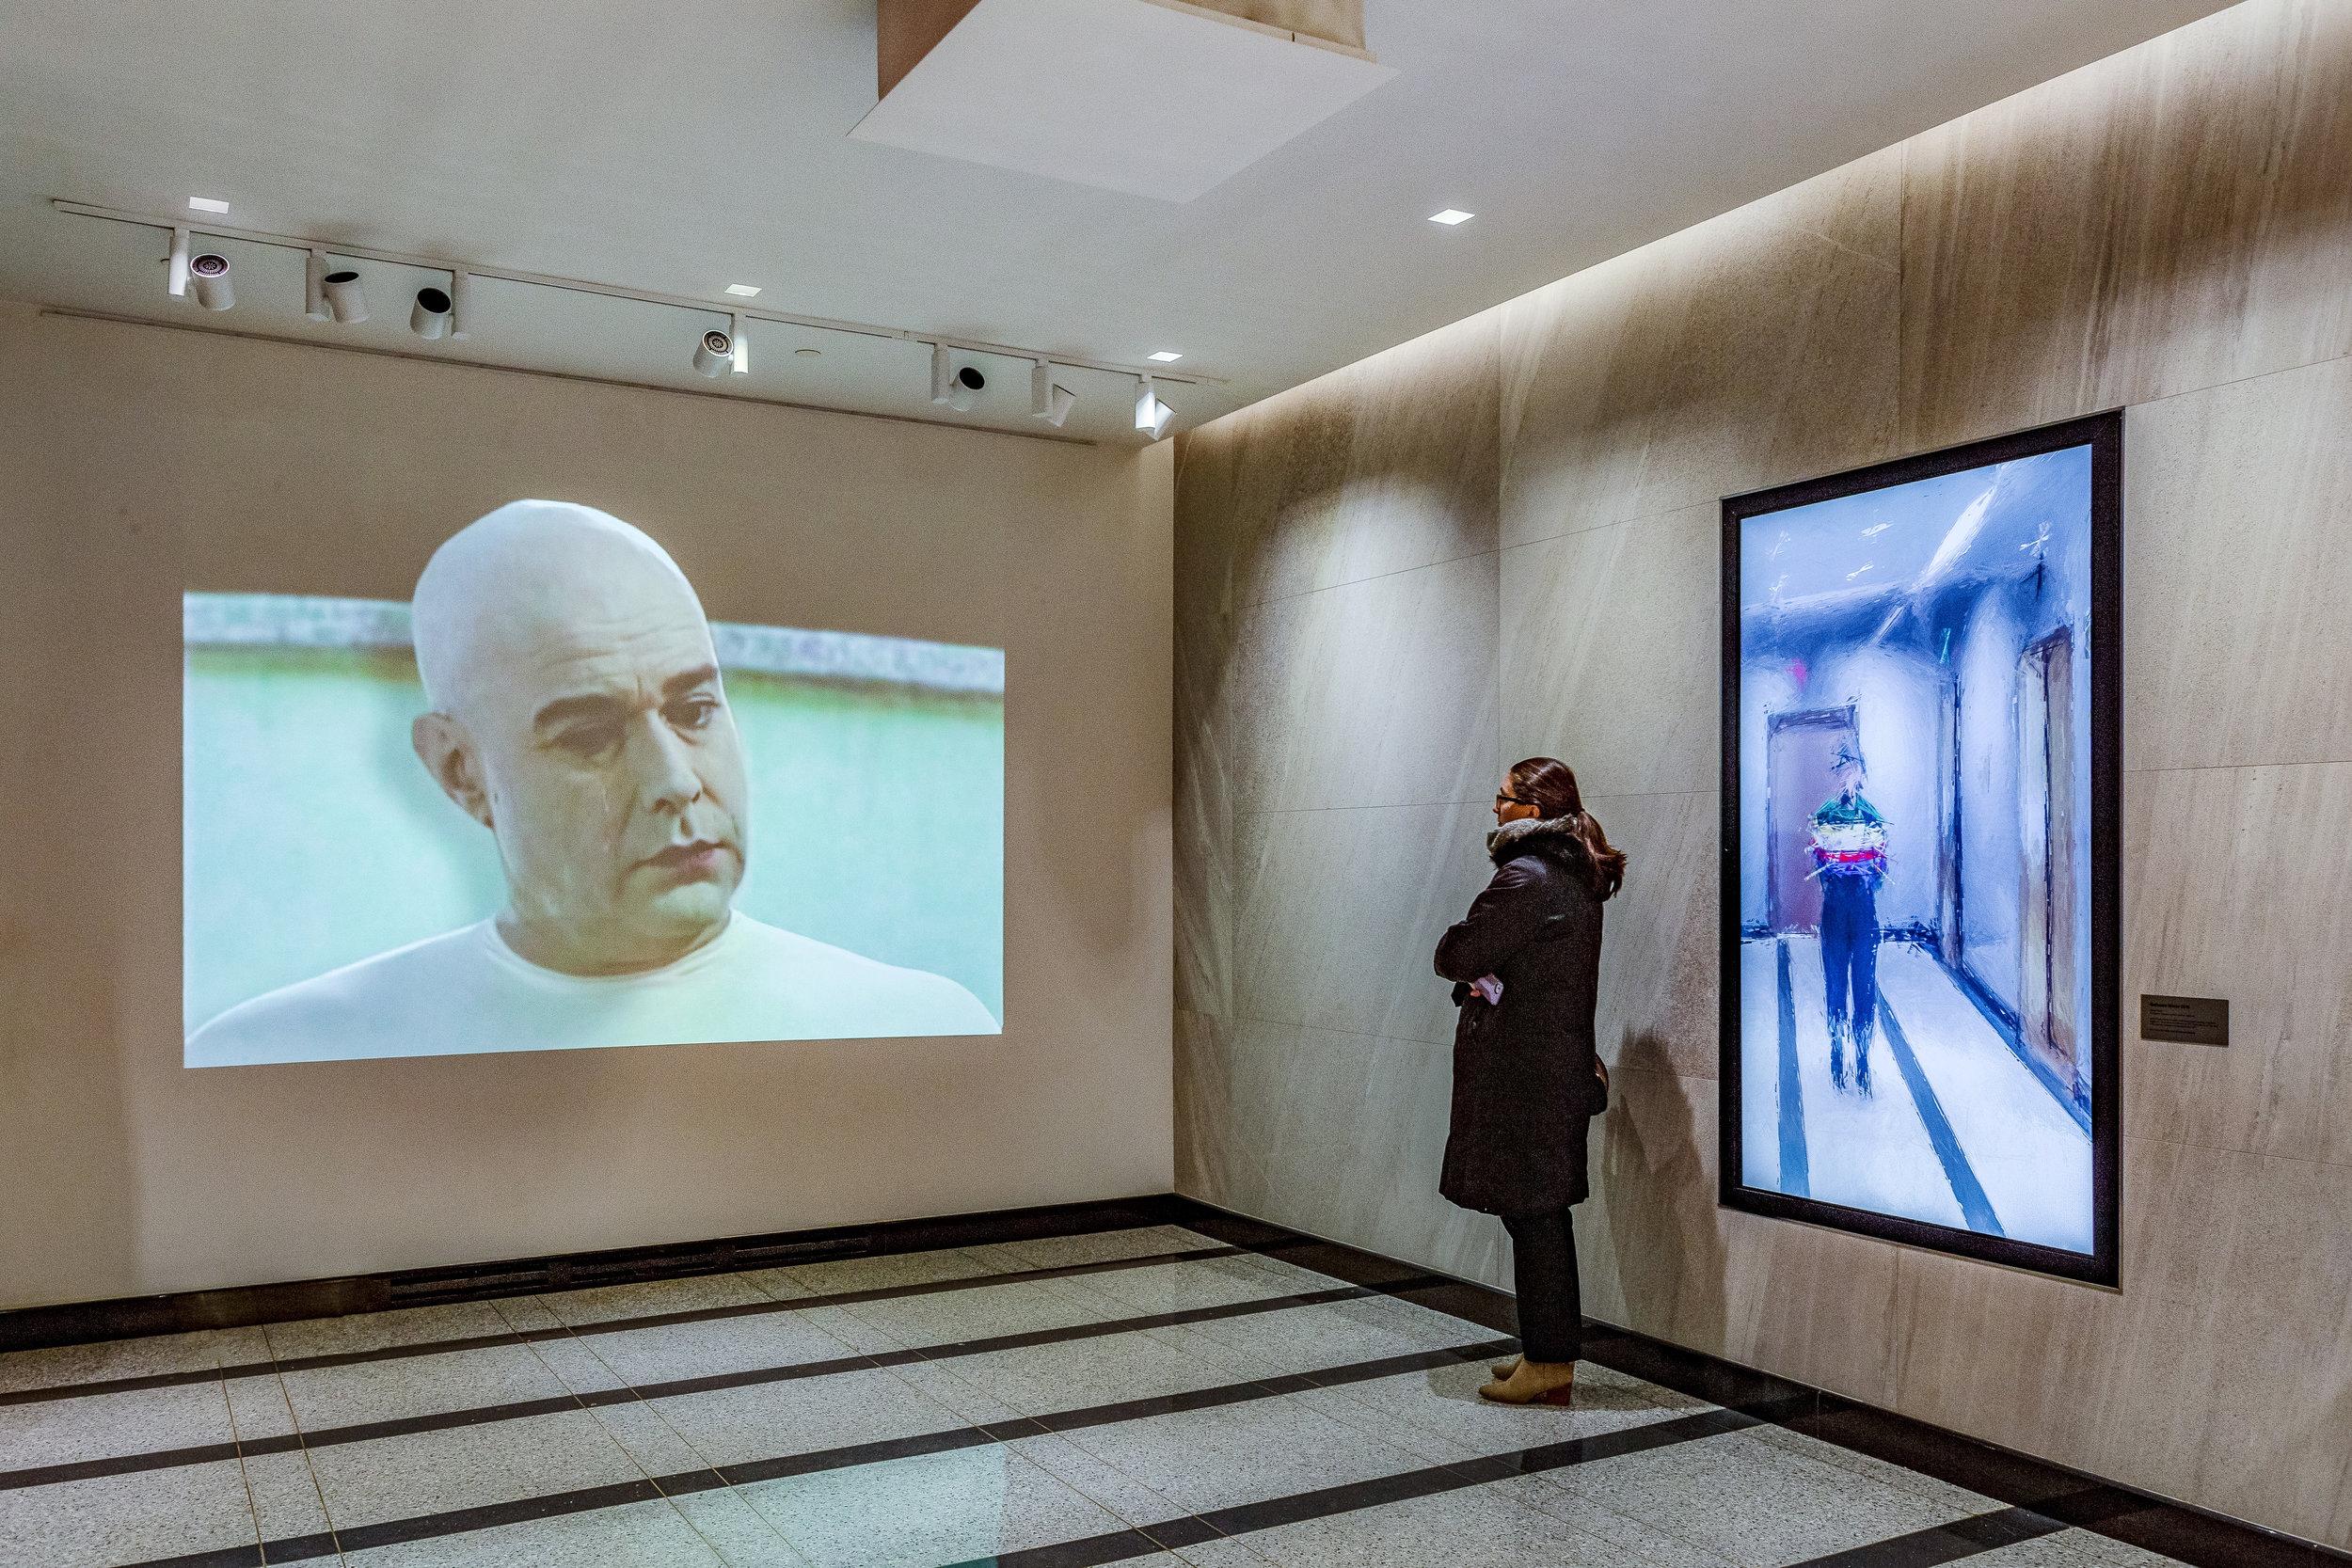 Gallery Wall Video Art